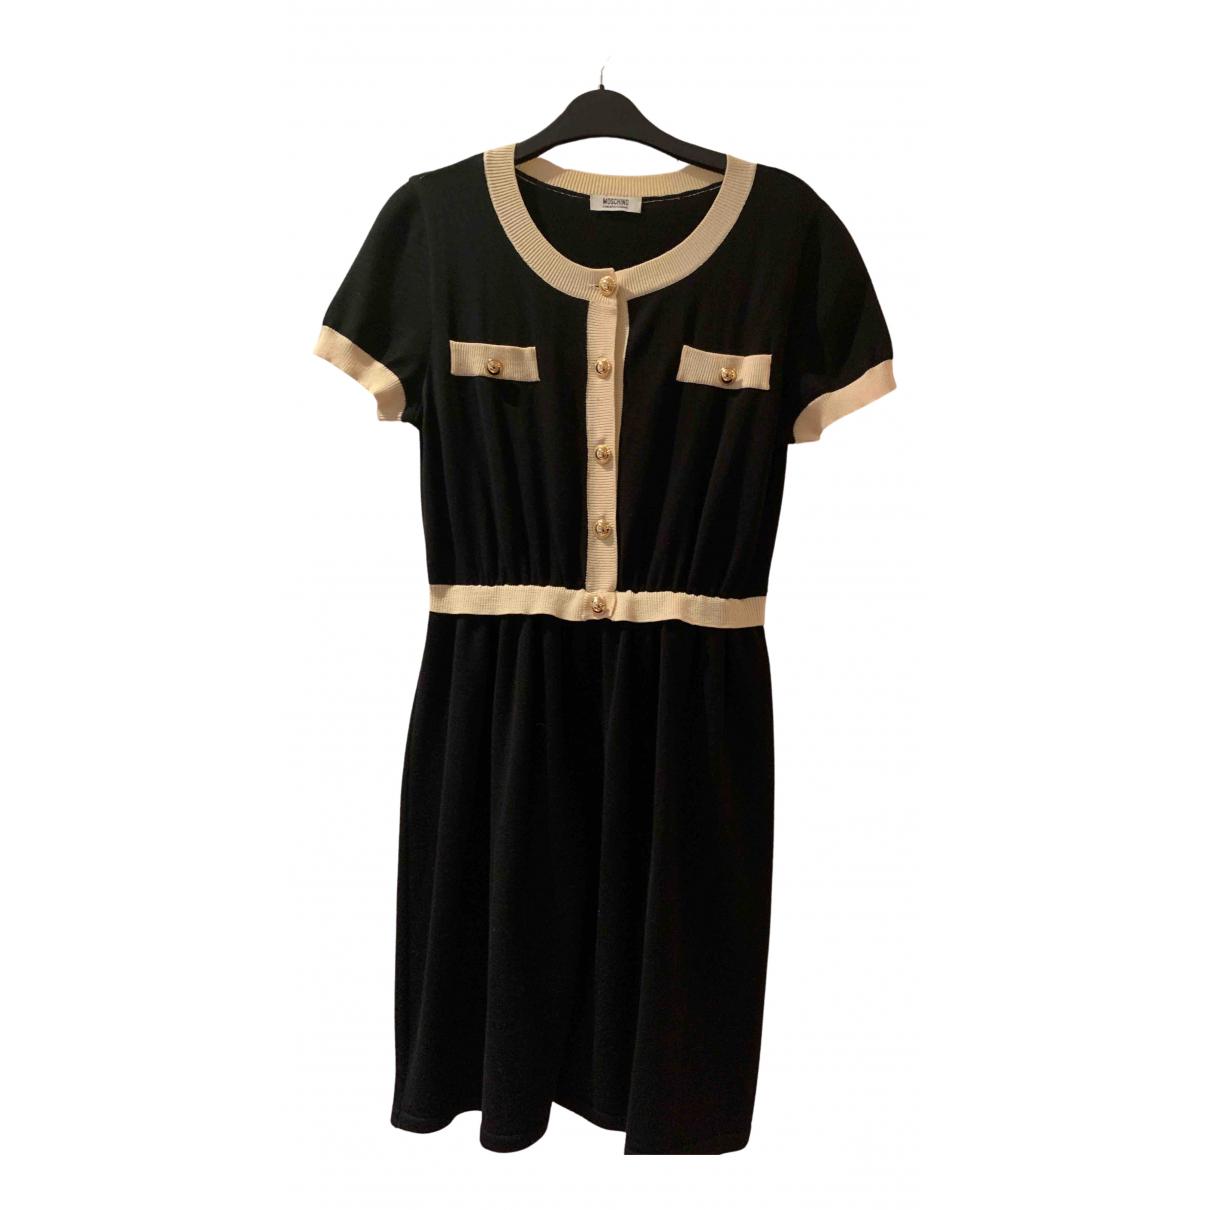 Moschino Cheap And Chic \N Black Wool dress for Women M International